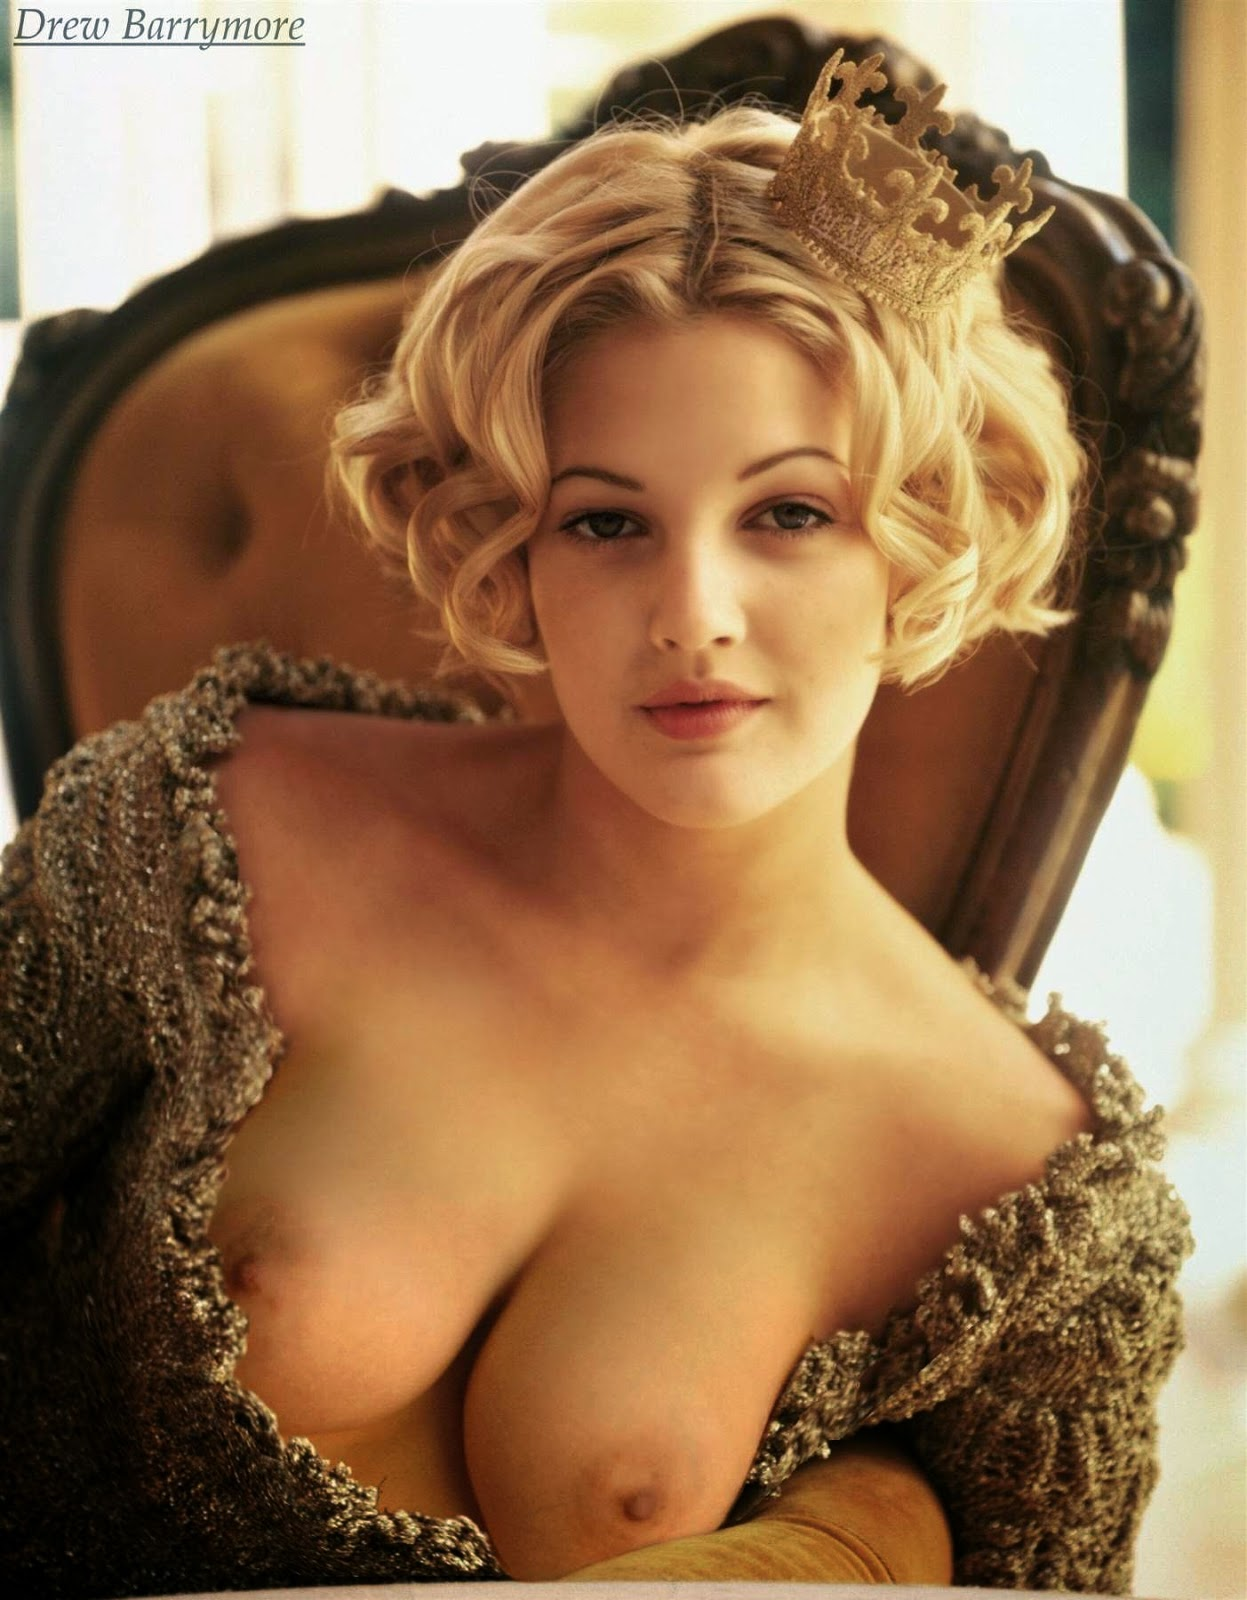 Barrymoore Nude 2